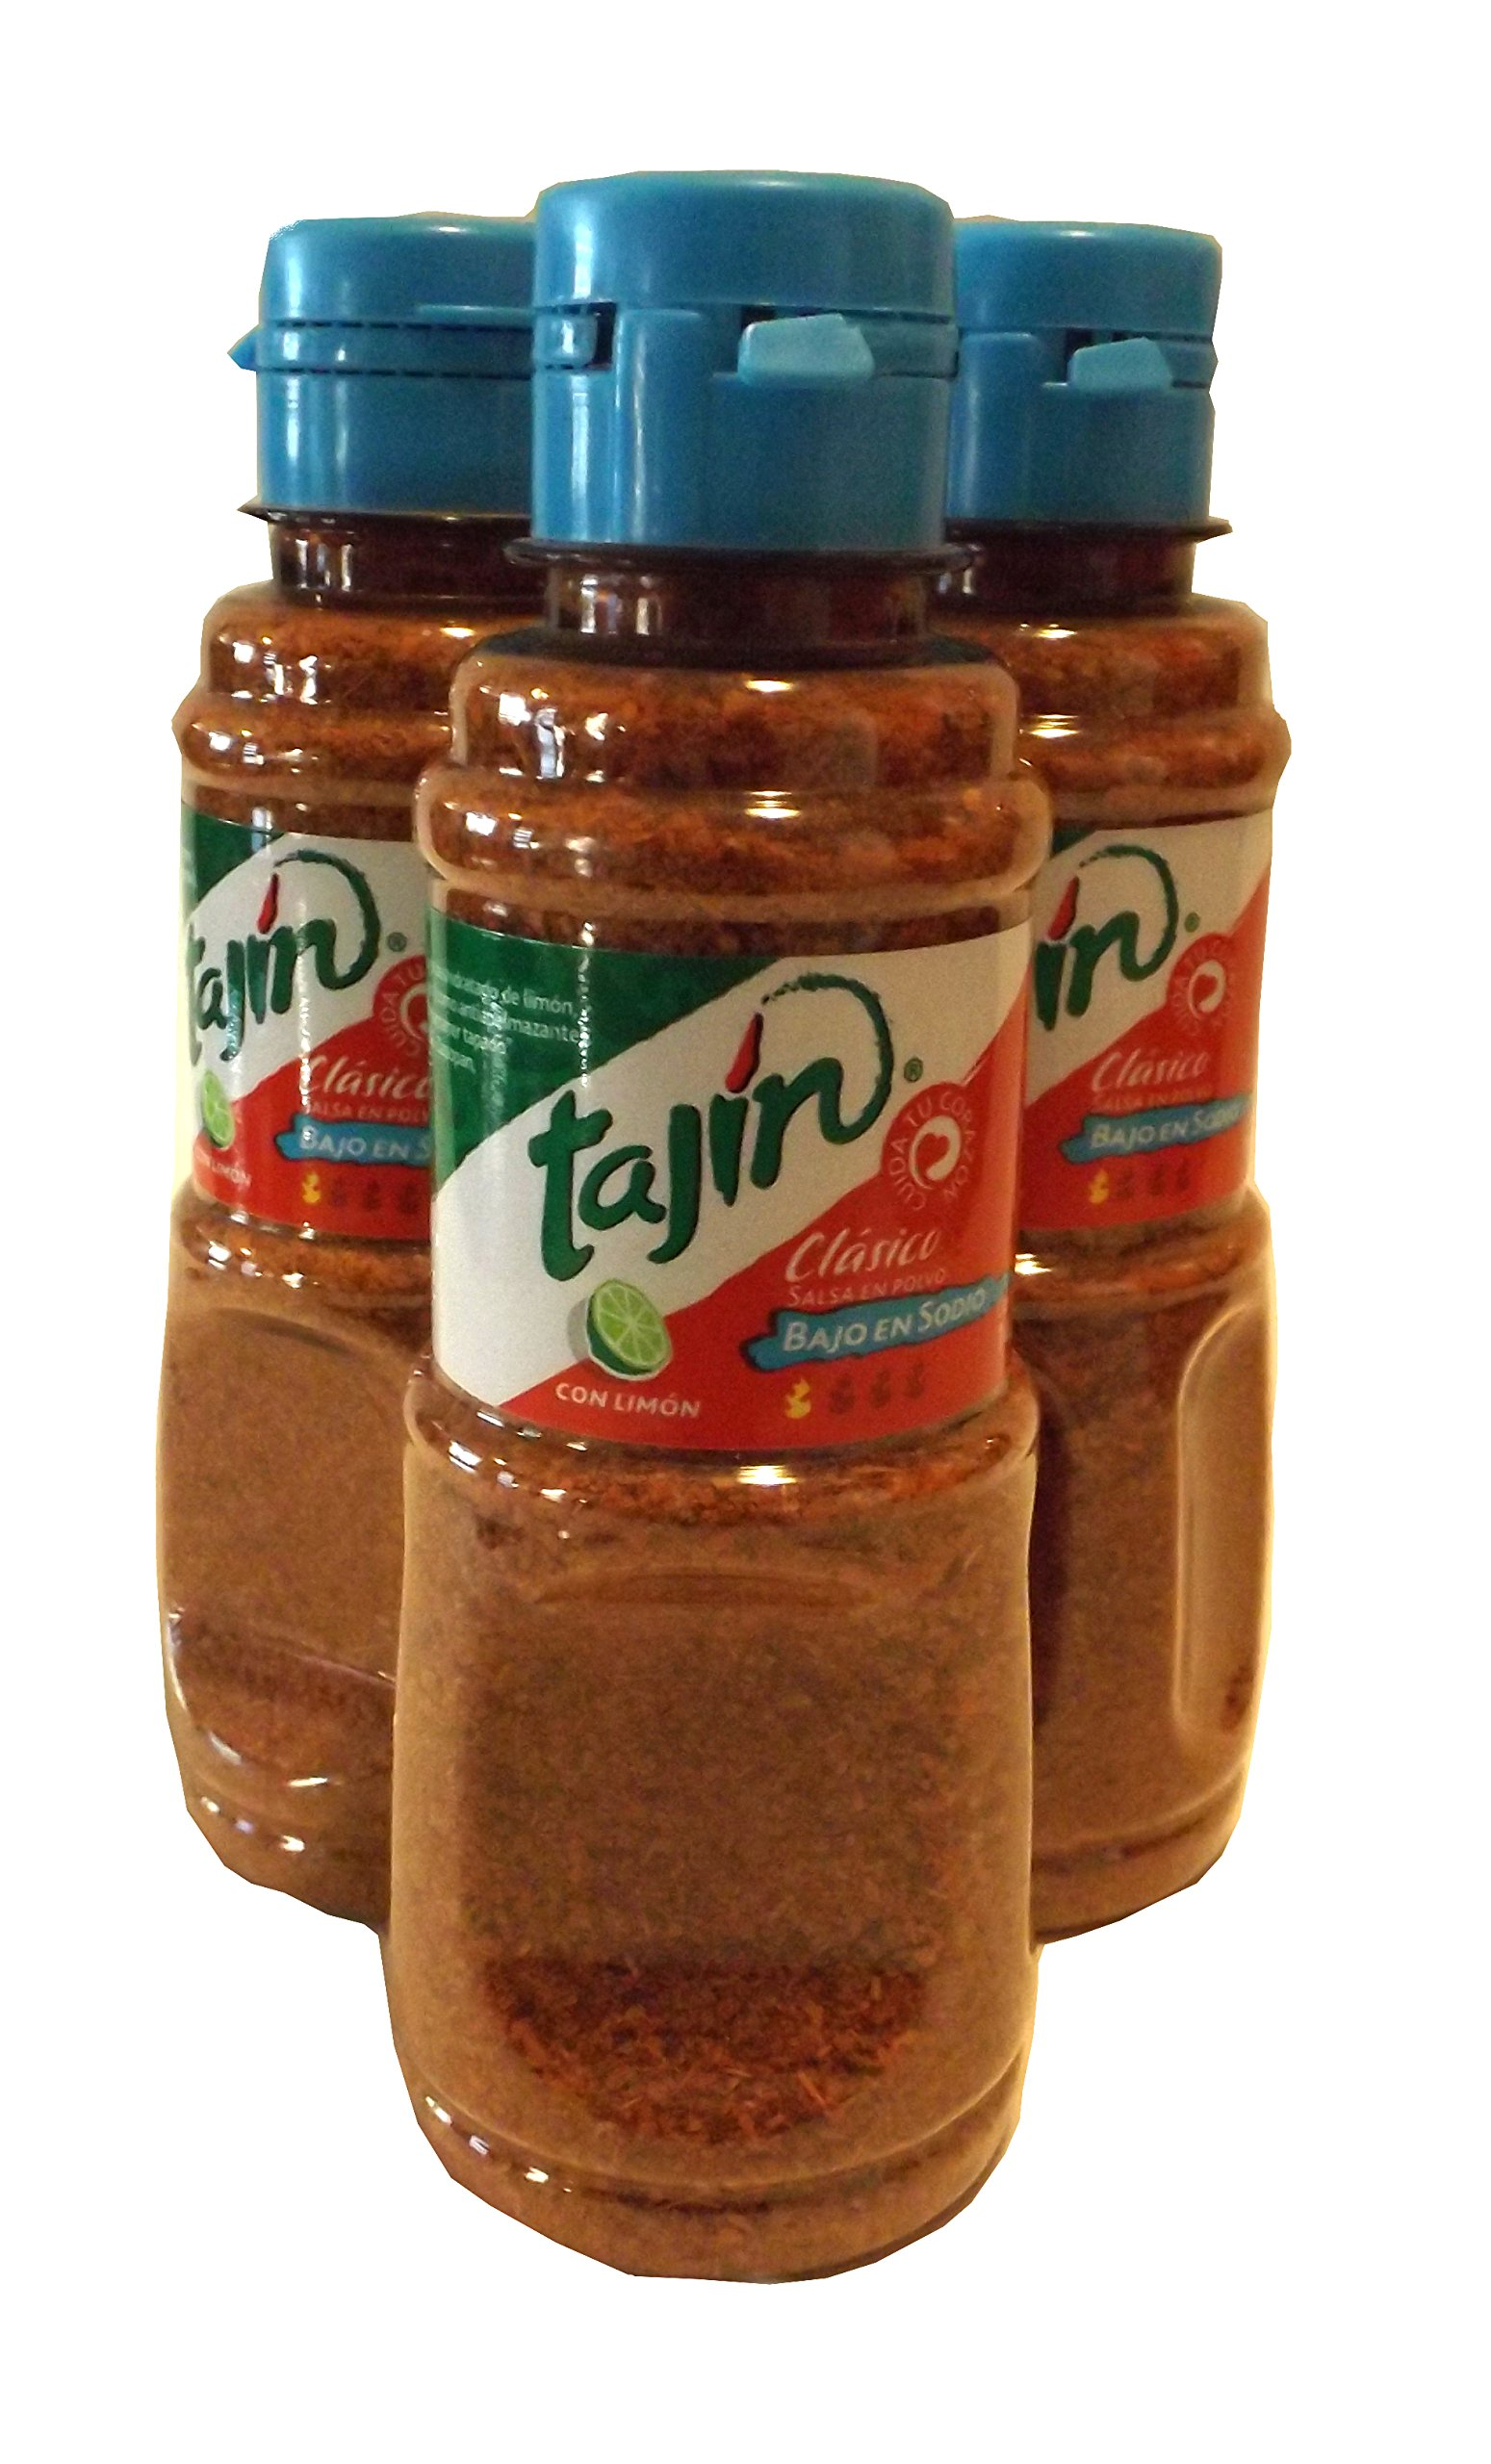 Tajin Classico Bajo En Sodio Con Limon 5 Oz. Seasoning (Pack of 3)